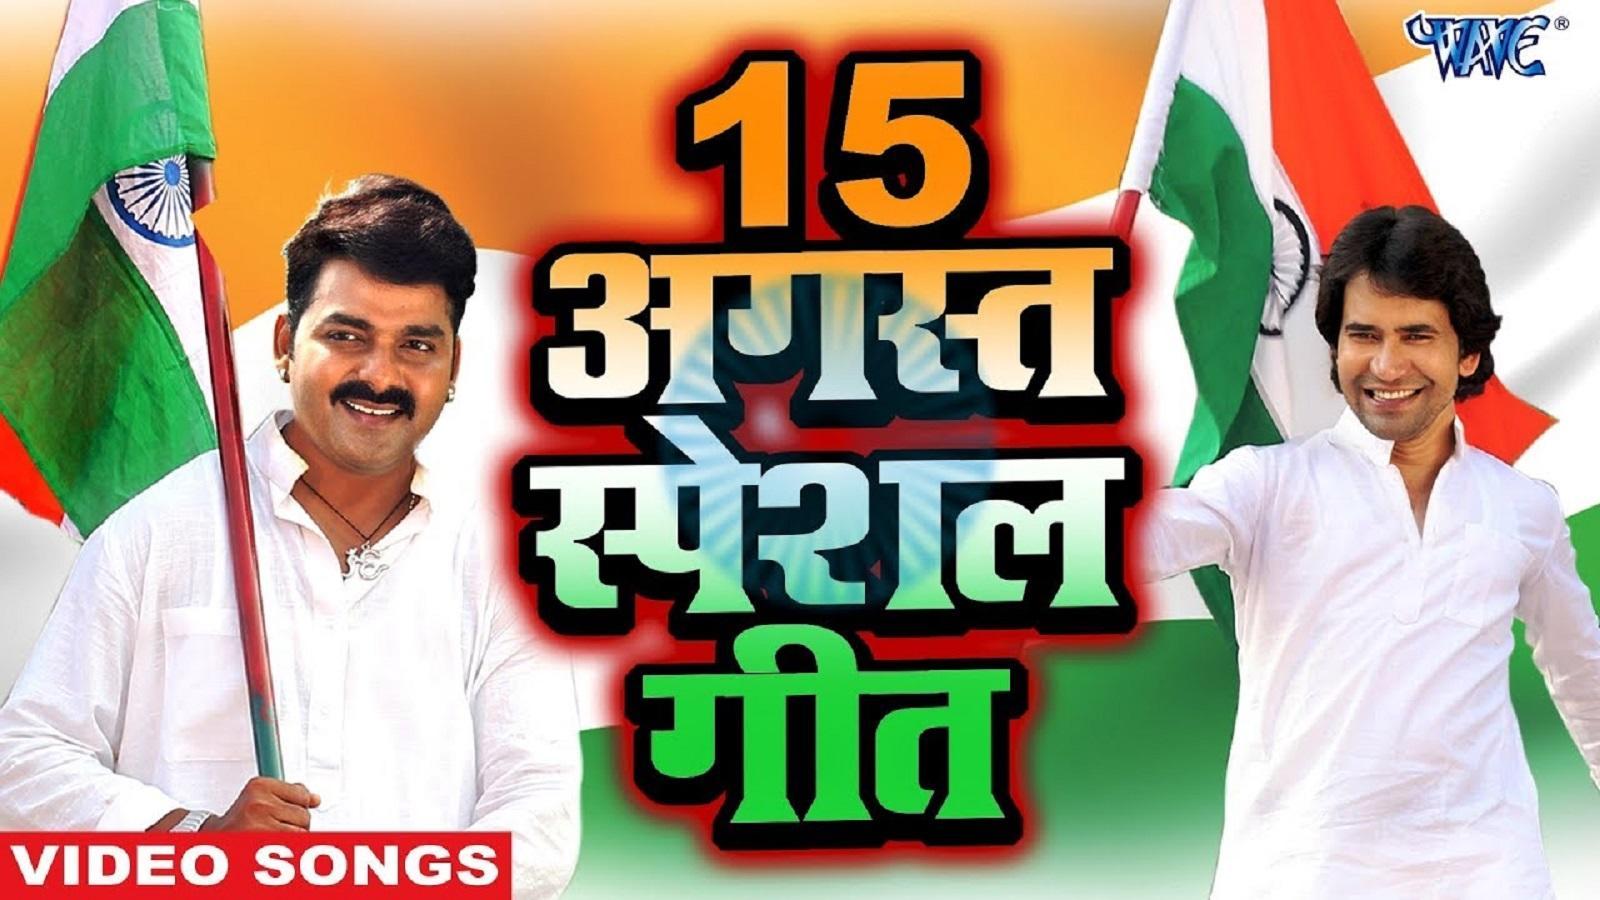 Bhojpuri Geet India Independence Day 15 August 2019 Special Bhojpuri Desh Bhakti Songs Sung By Pawan Singh And Nirahua